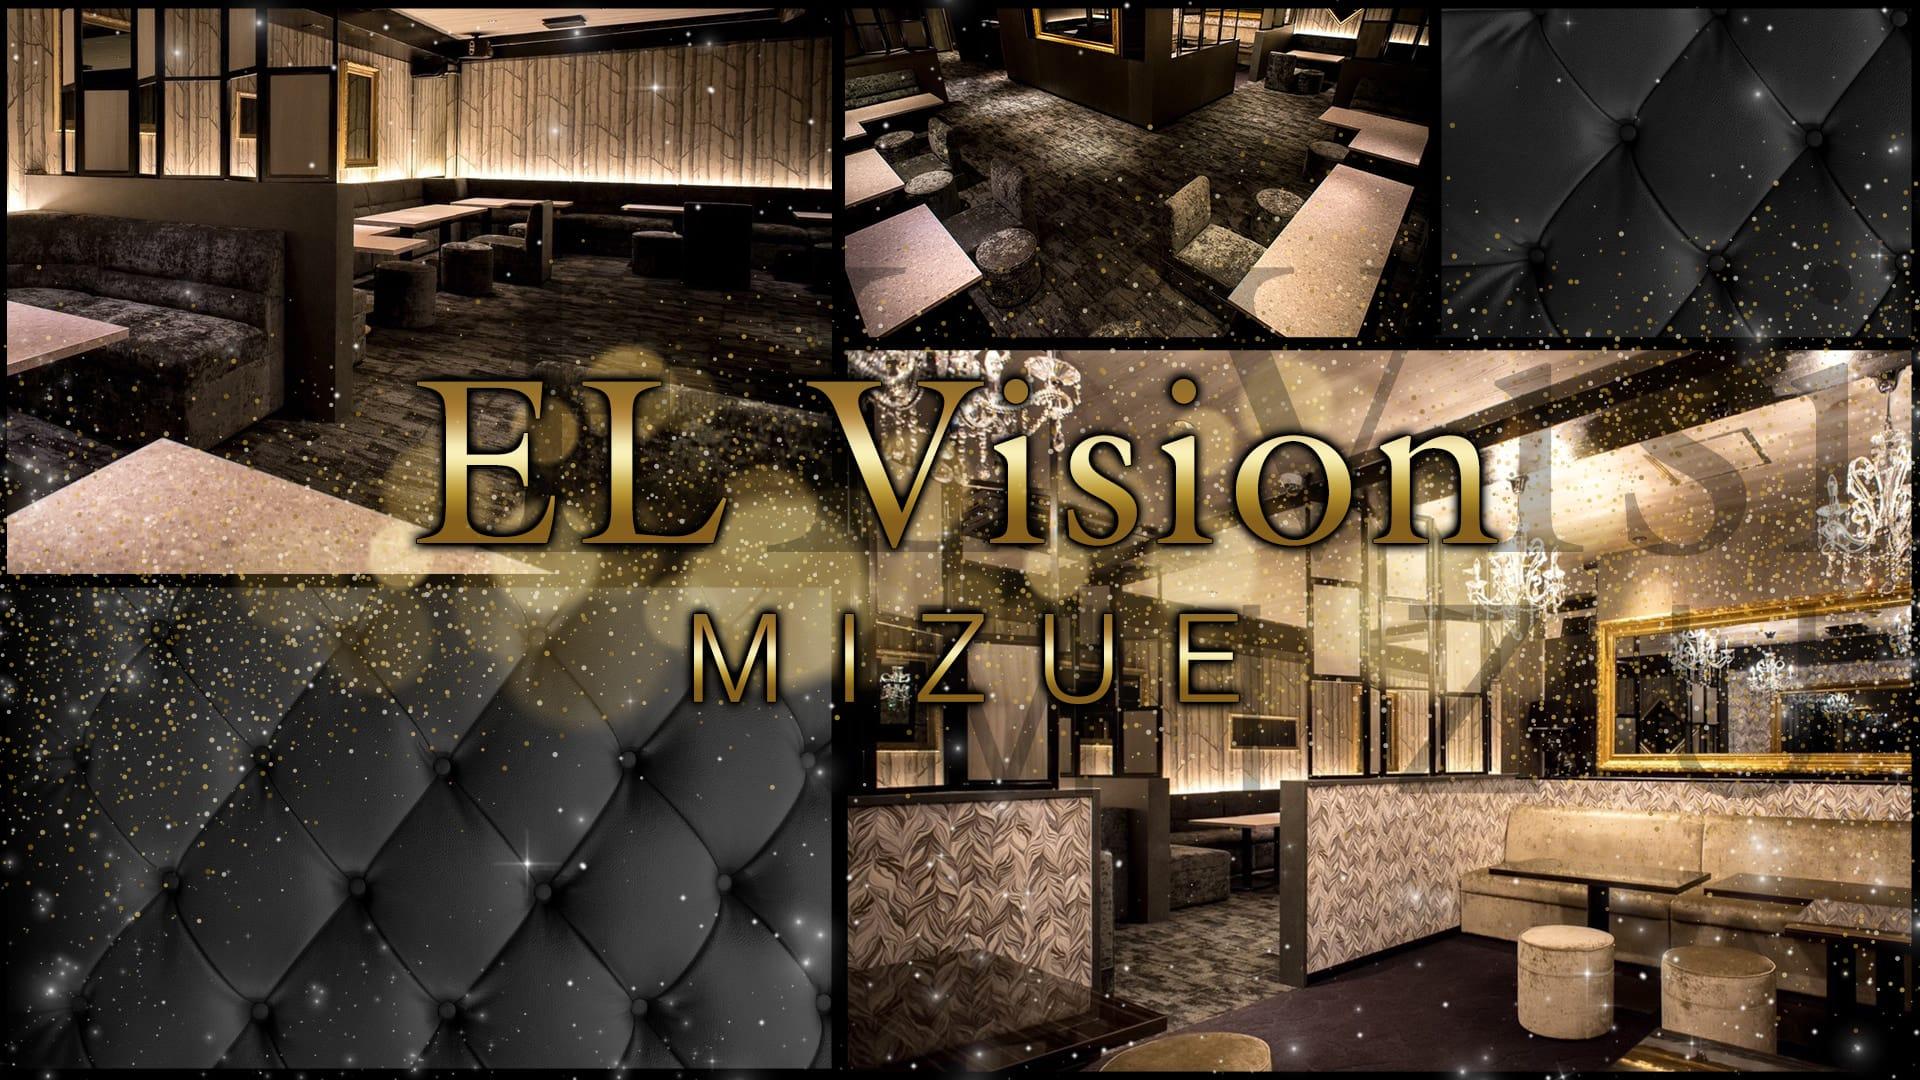 EL-Vision(エルヴィジョン)【公式求人・体入情報】 錦糸町姉キャバ・半熟キャバ TOP画像